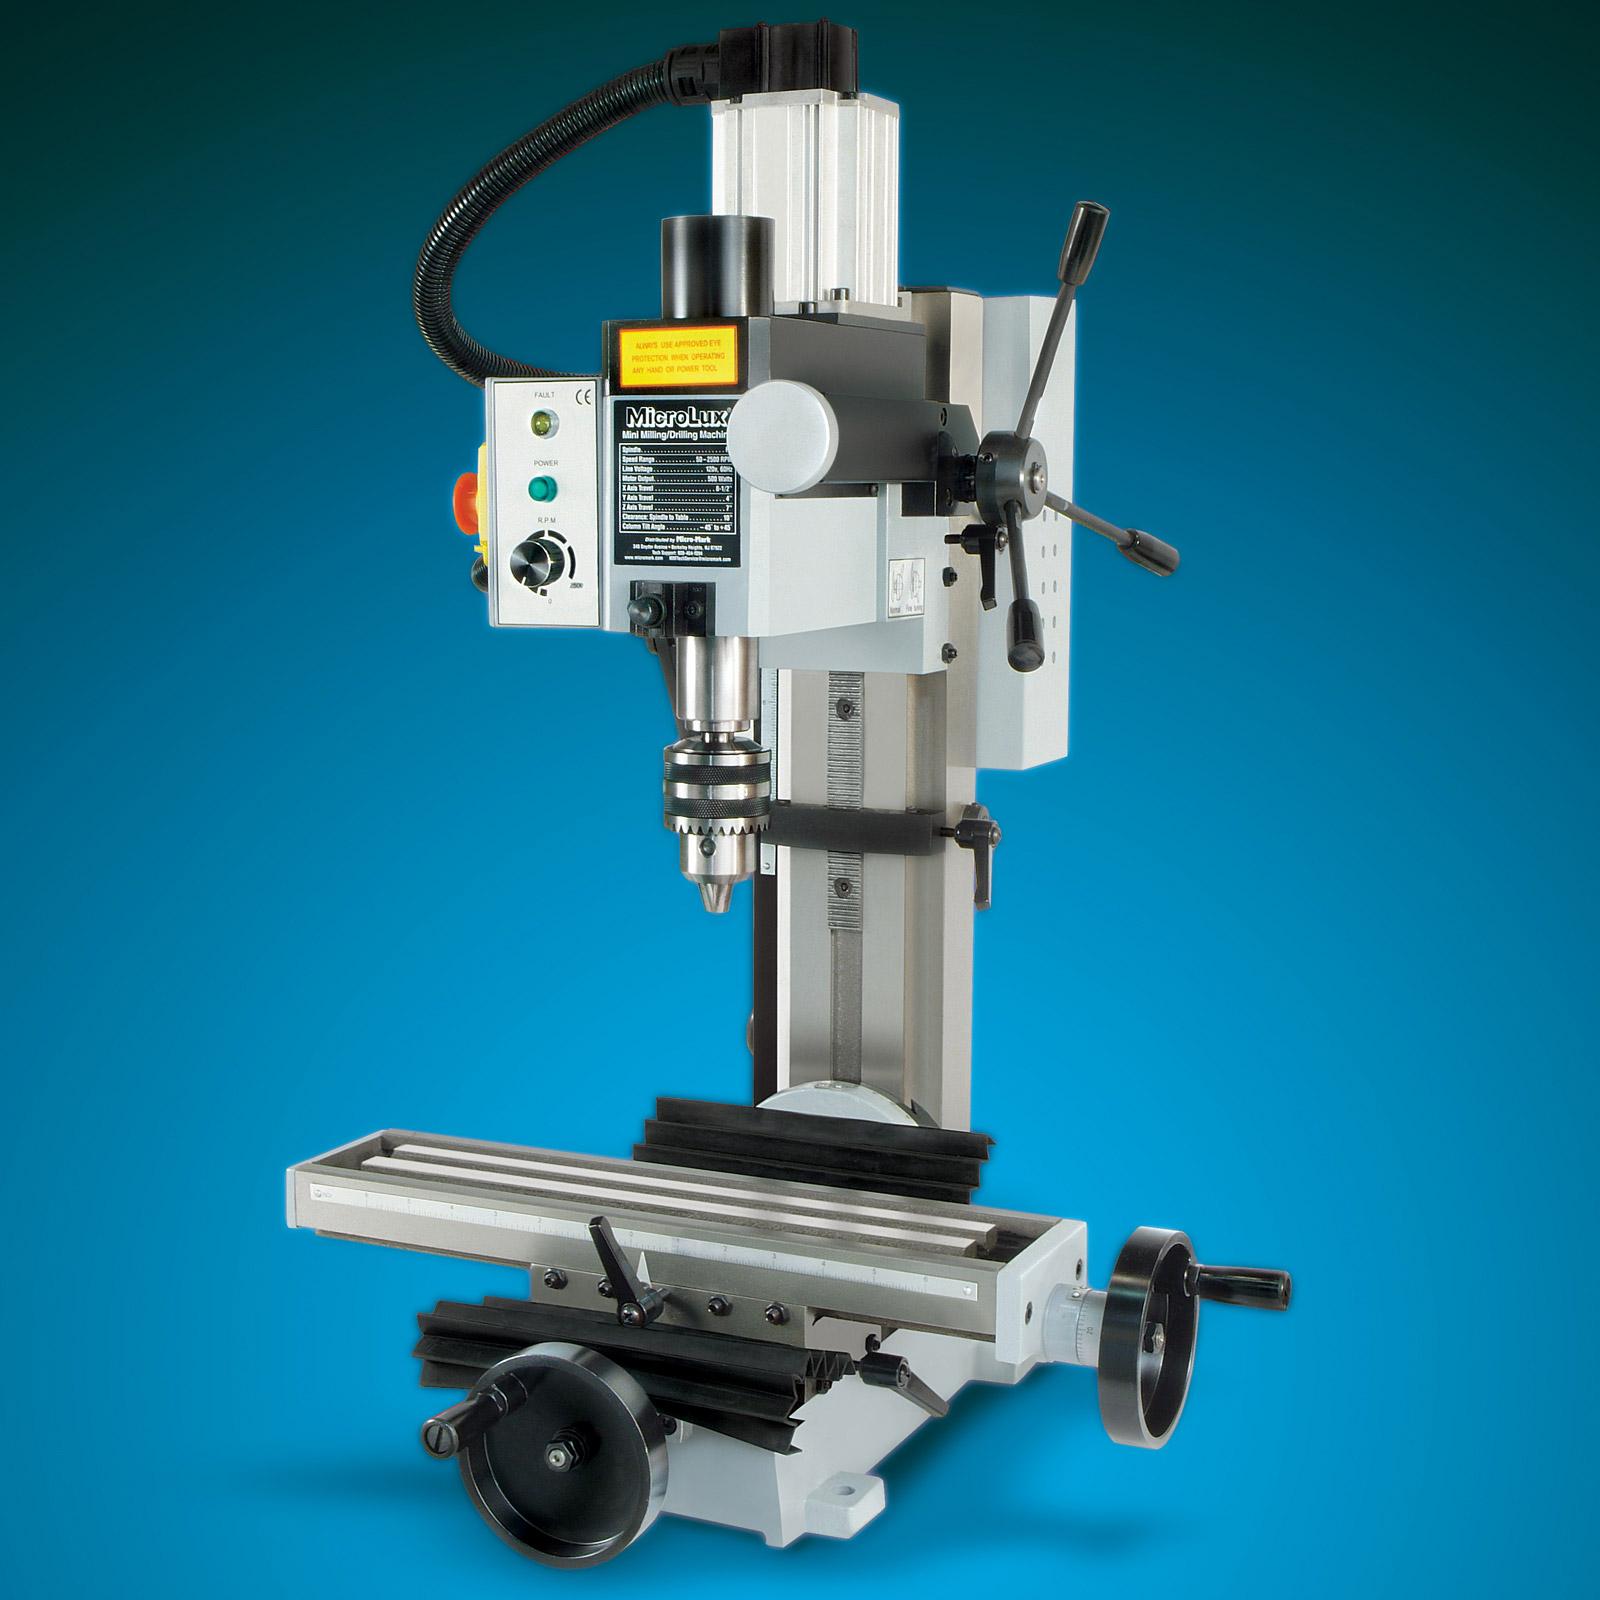 Microlux High Precision Heavy Duty R8 Miniature Milling Machine Bldc Cnc Wiring Schematic 500w